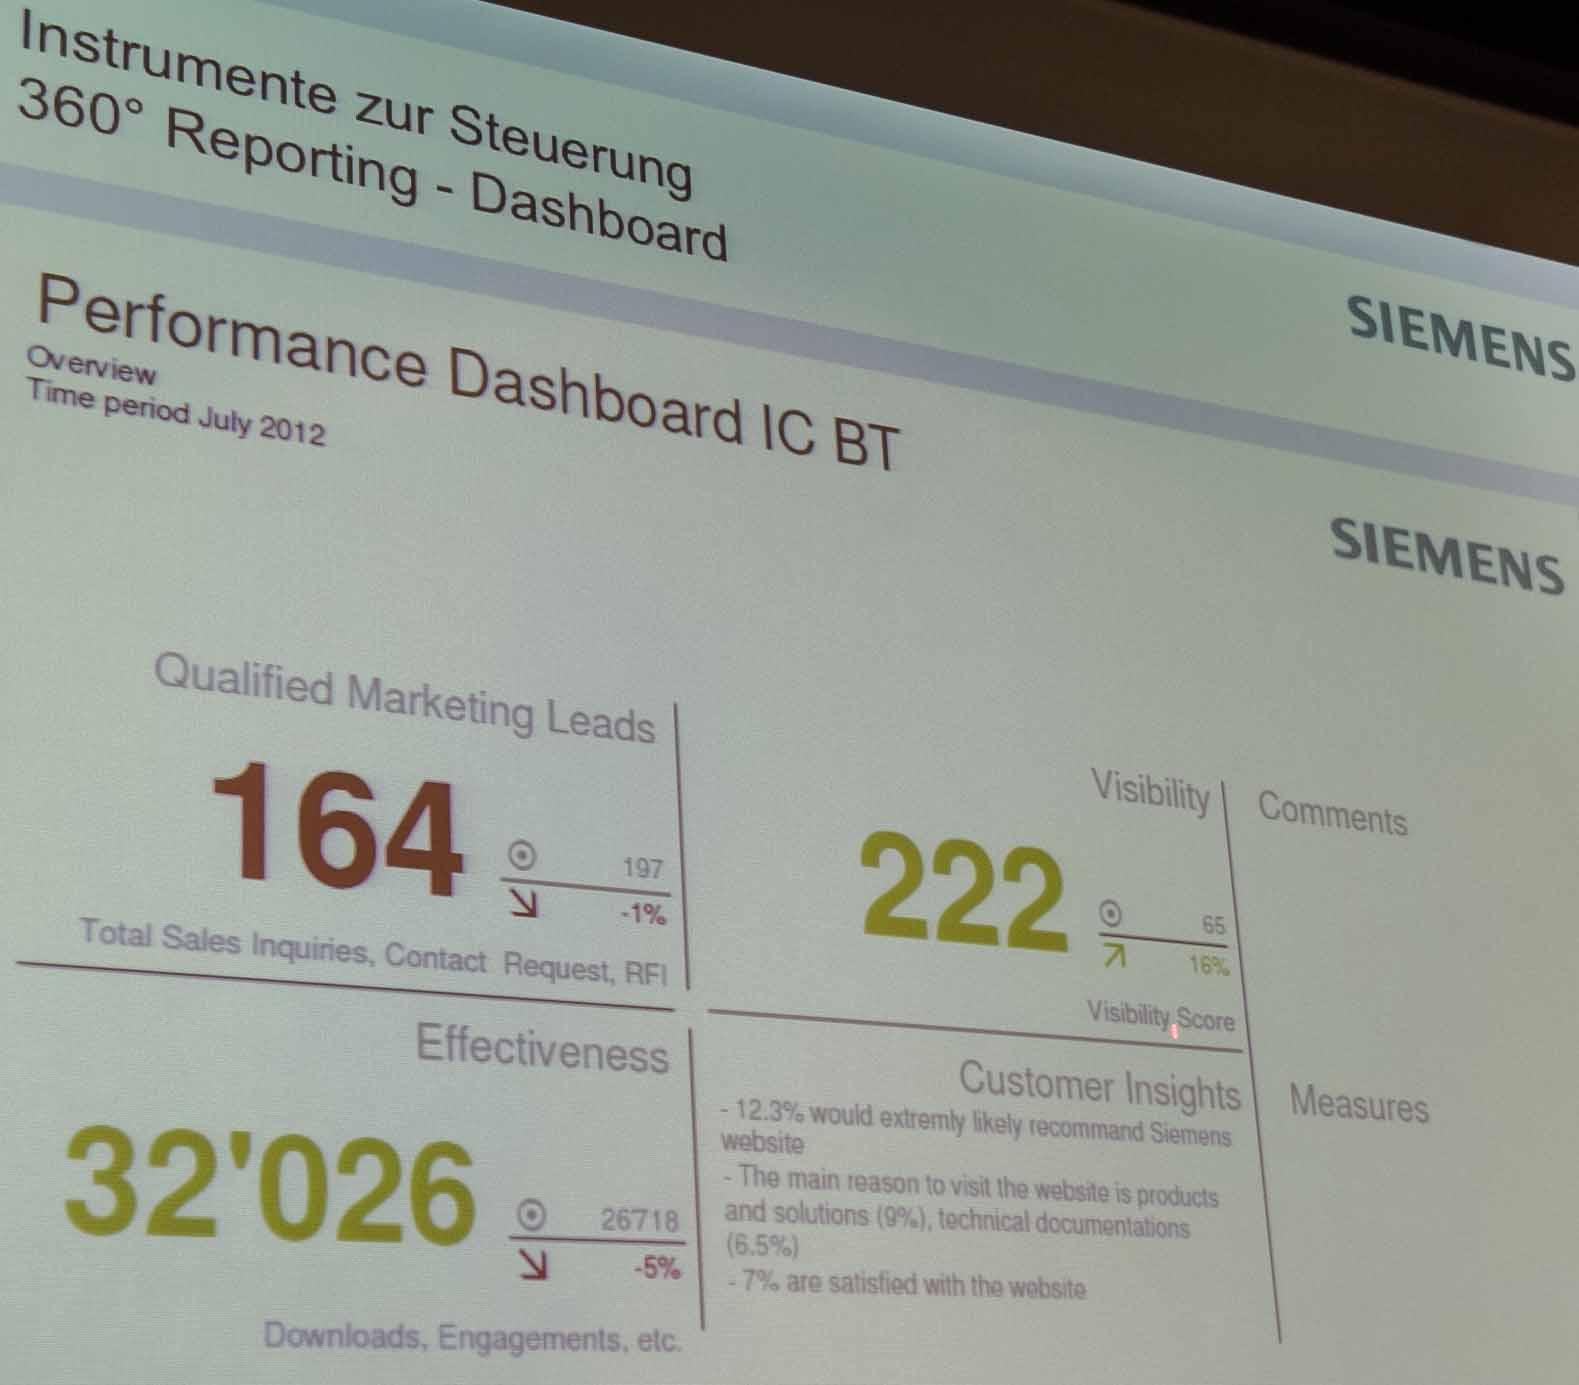 KPI-Dashboard-Siemens-Online-Kommunikation